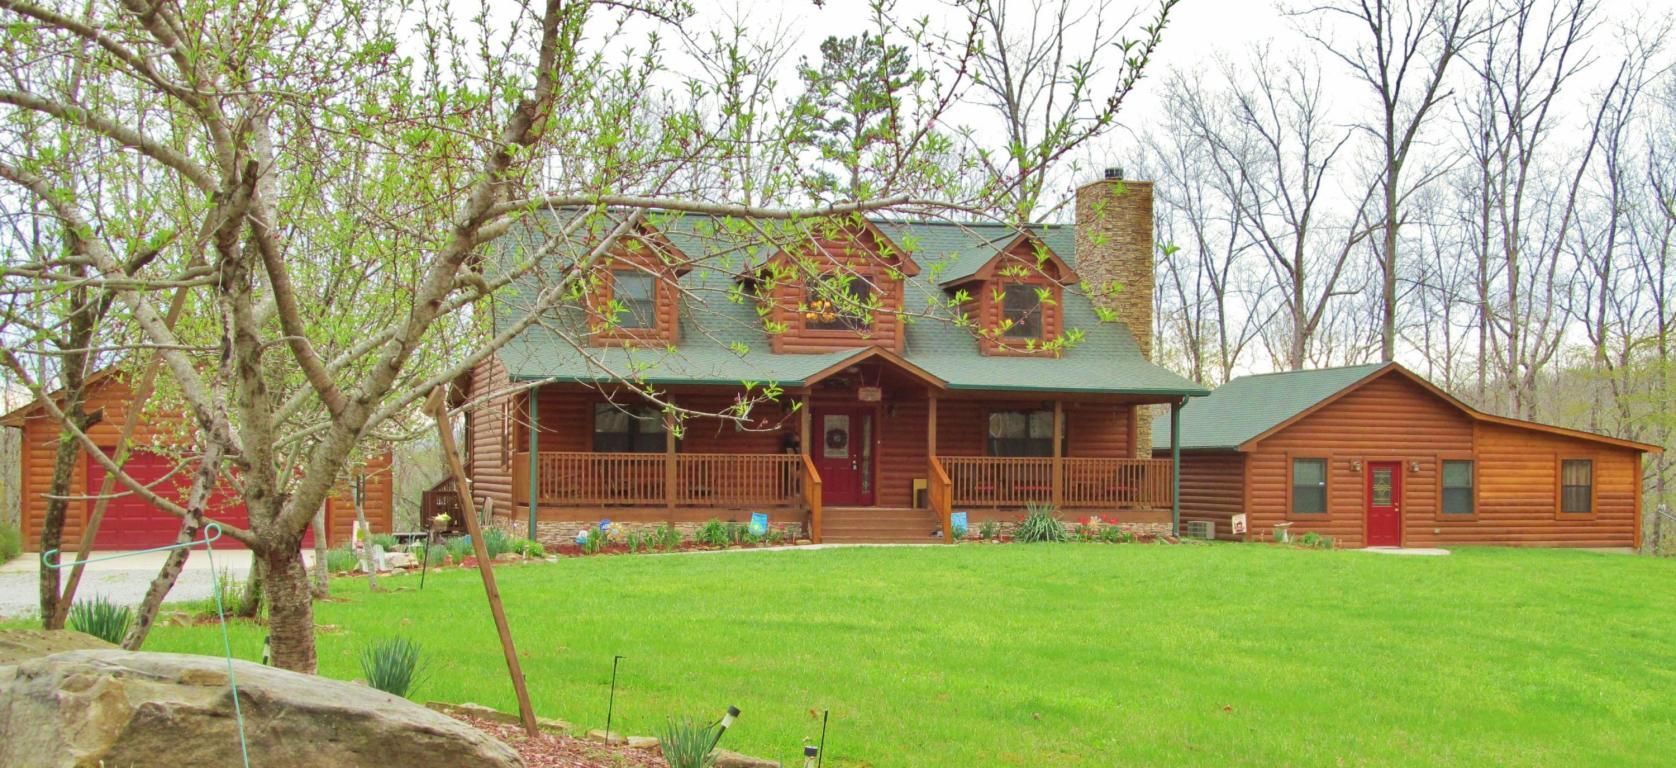 380 Cherokee Trail, Wartburg, TN 37887